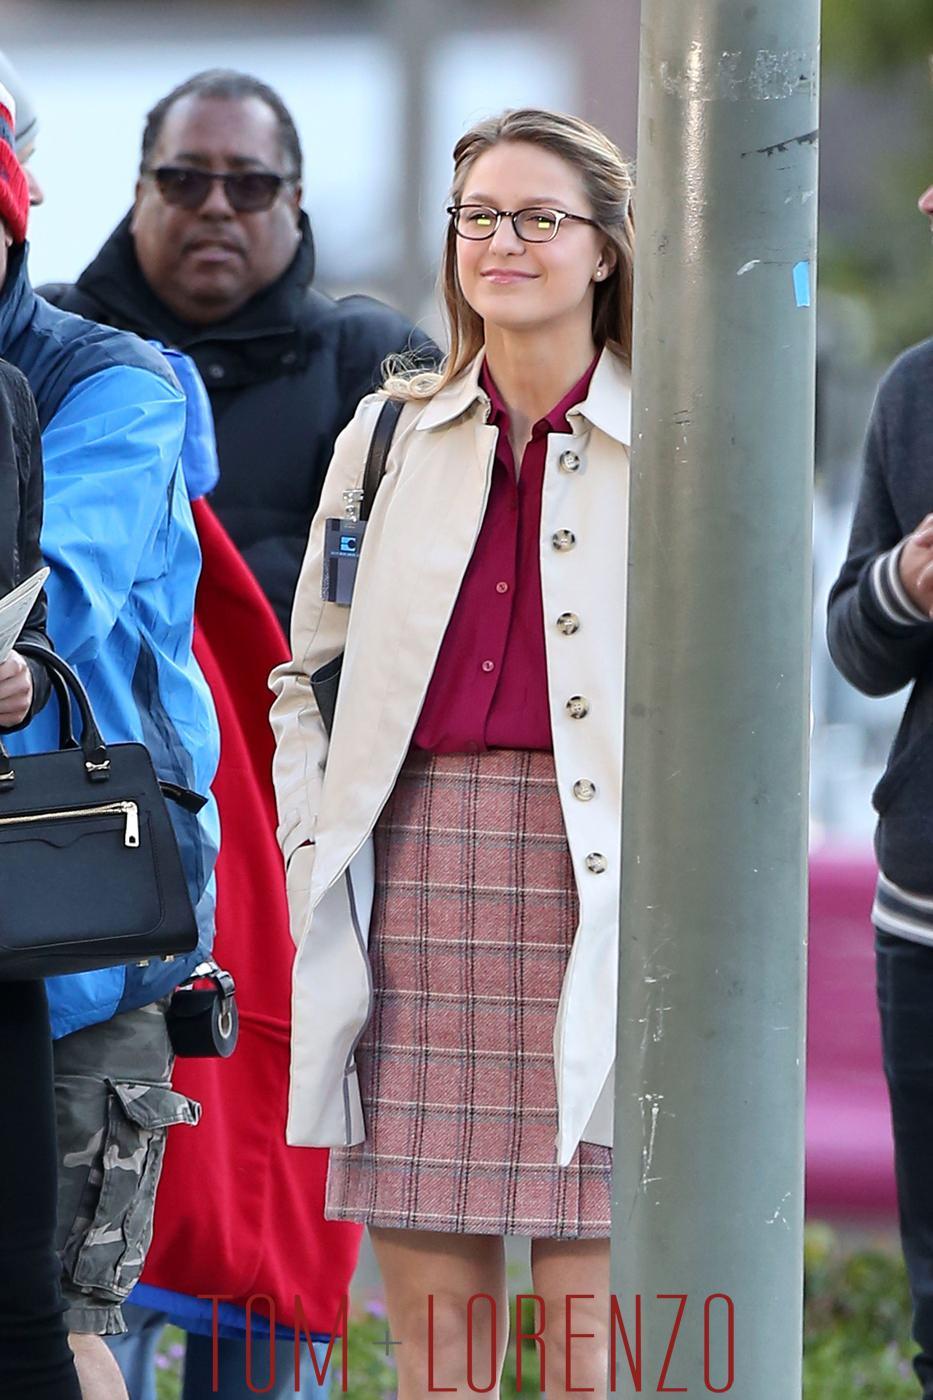 Melissa-Benoist-On-TV-Set-Supergirl-WOTSWS-Tom-Lorenzo-Site (1)